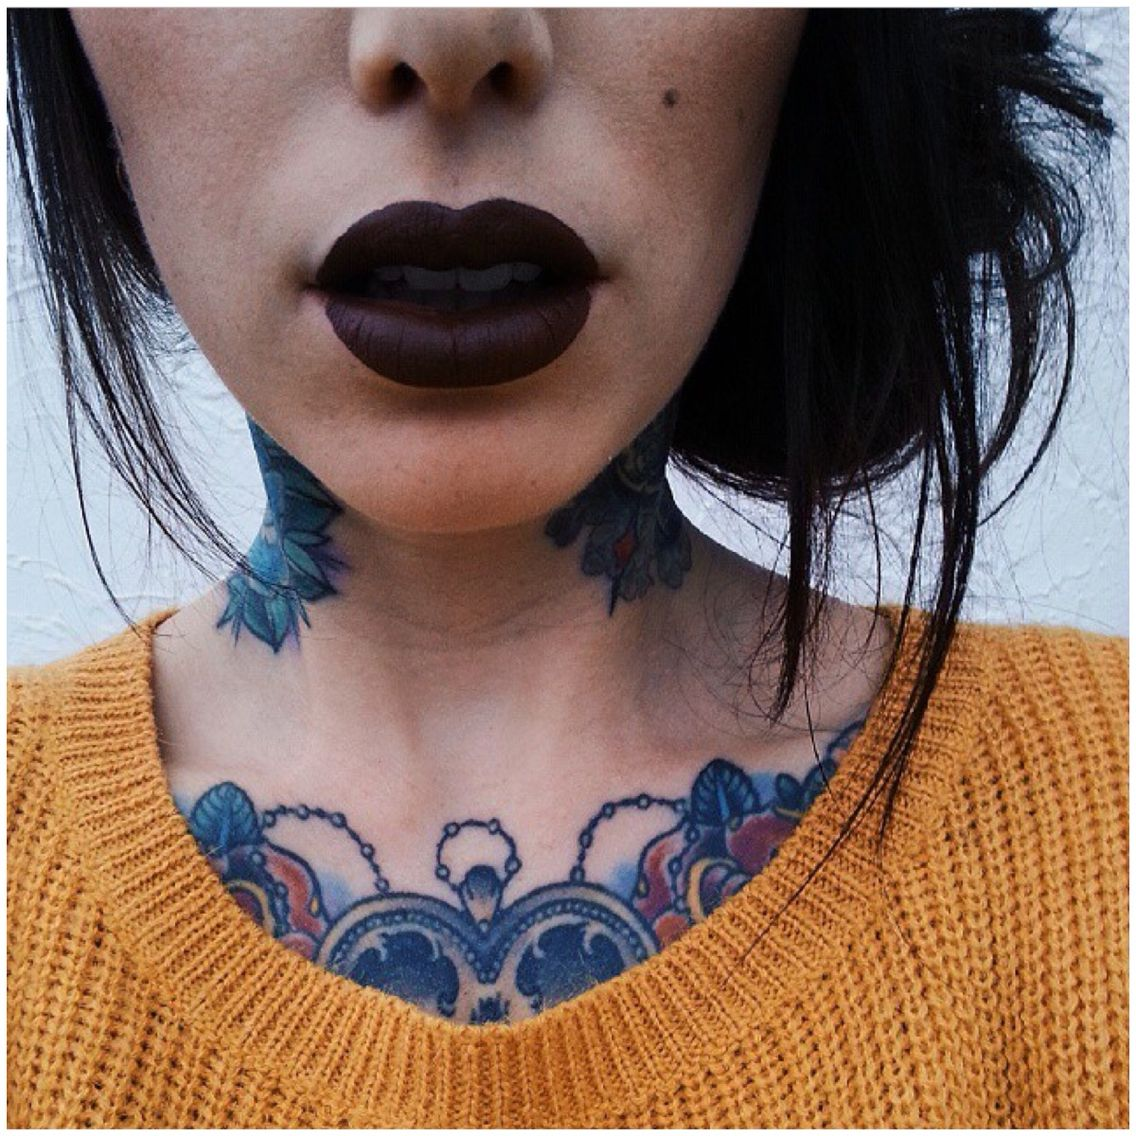 Limecrime Velveteen, Makeup, Neck Tattoos, Chest Piece